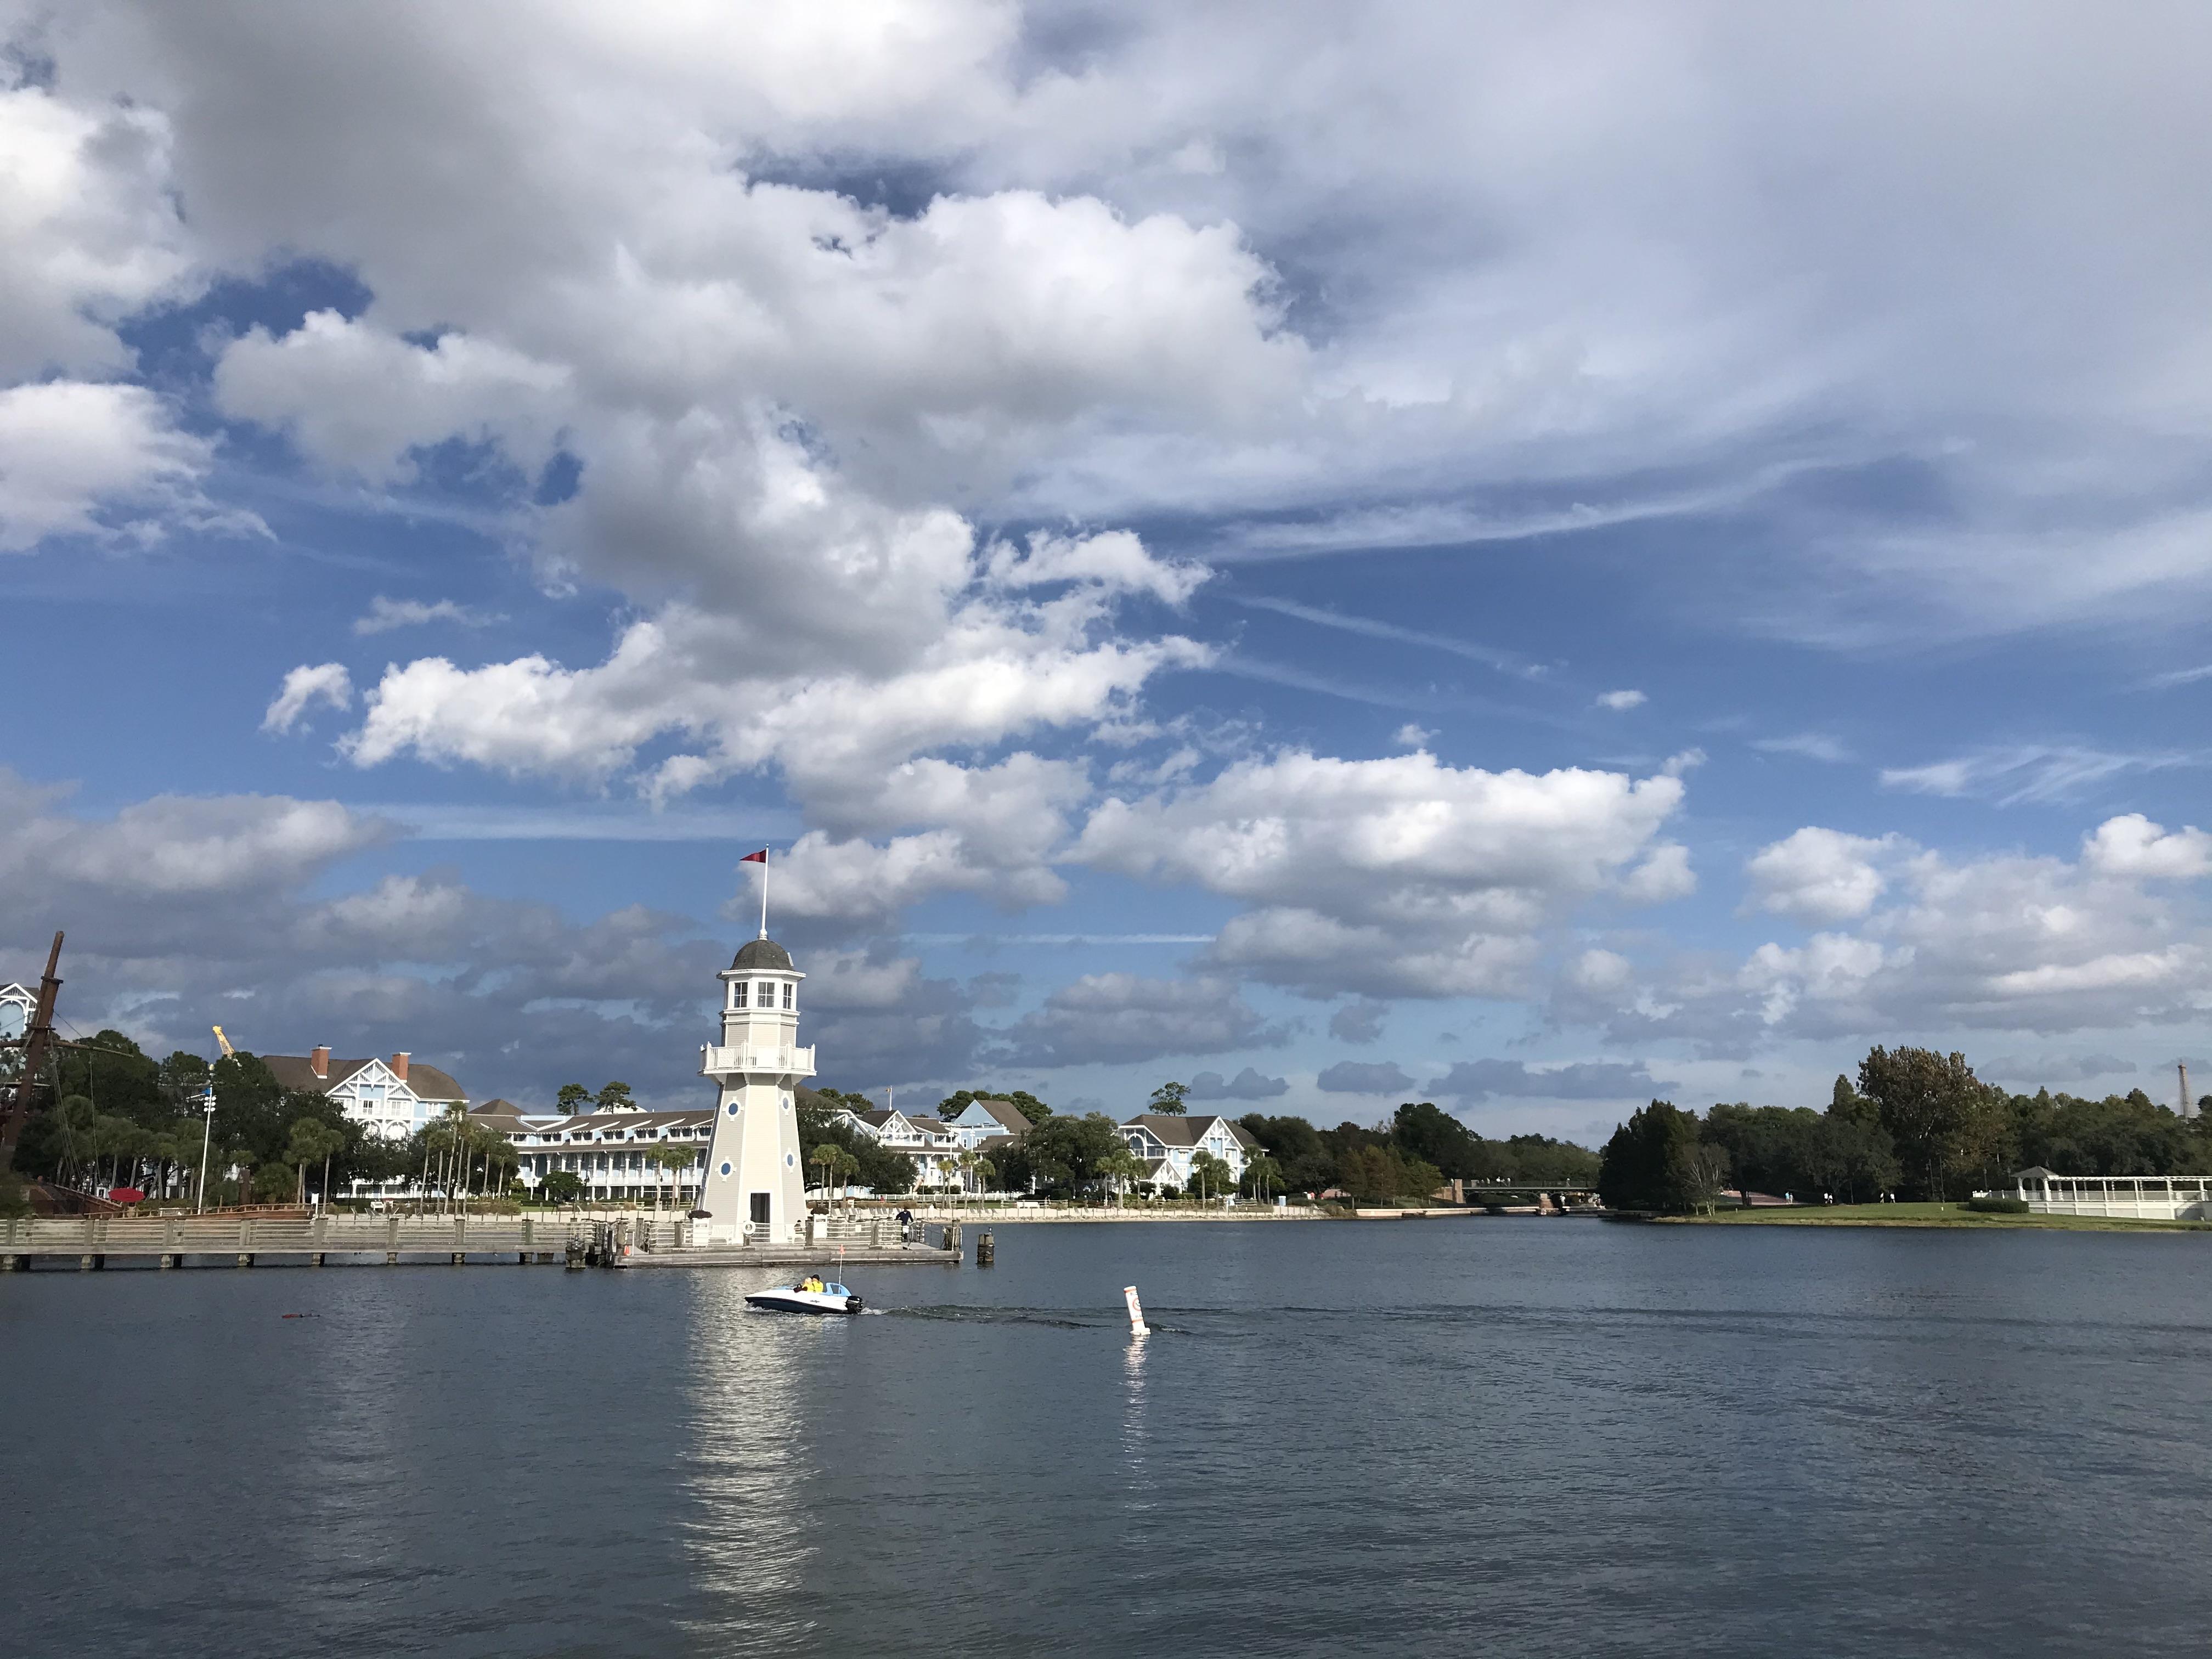 autumn clouds over disney's yacht club resort